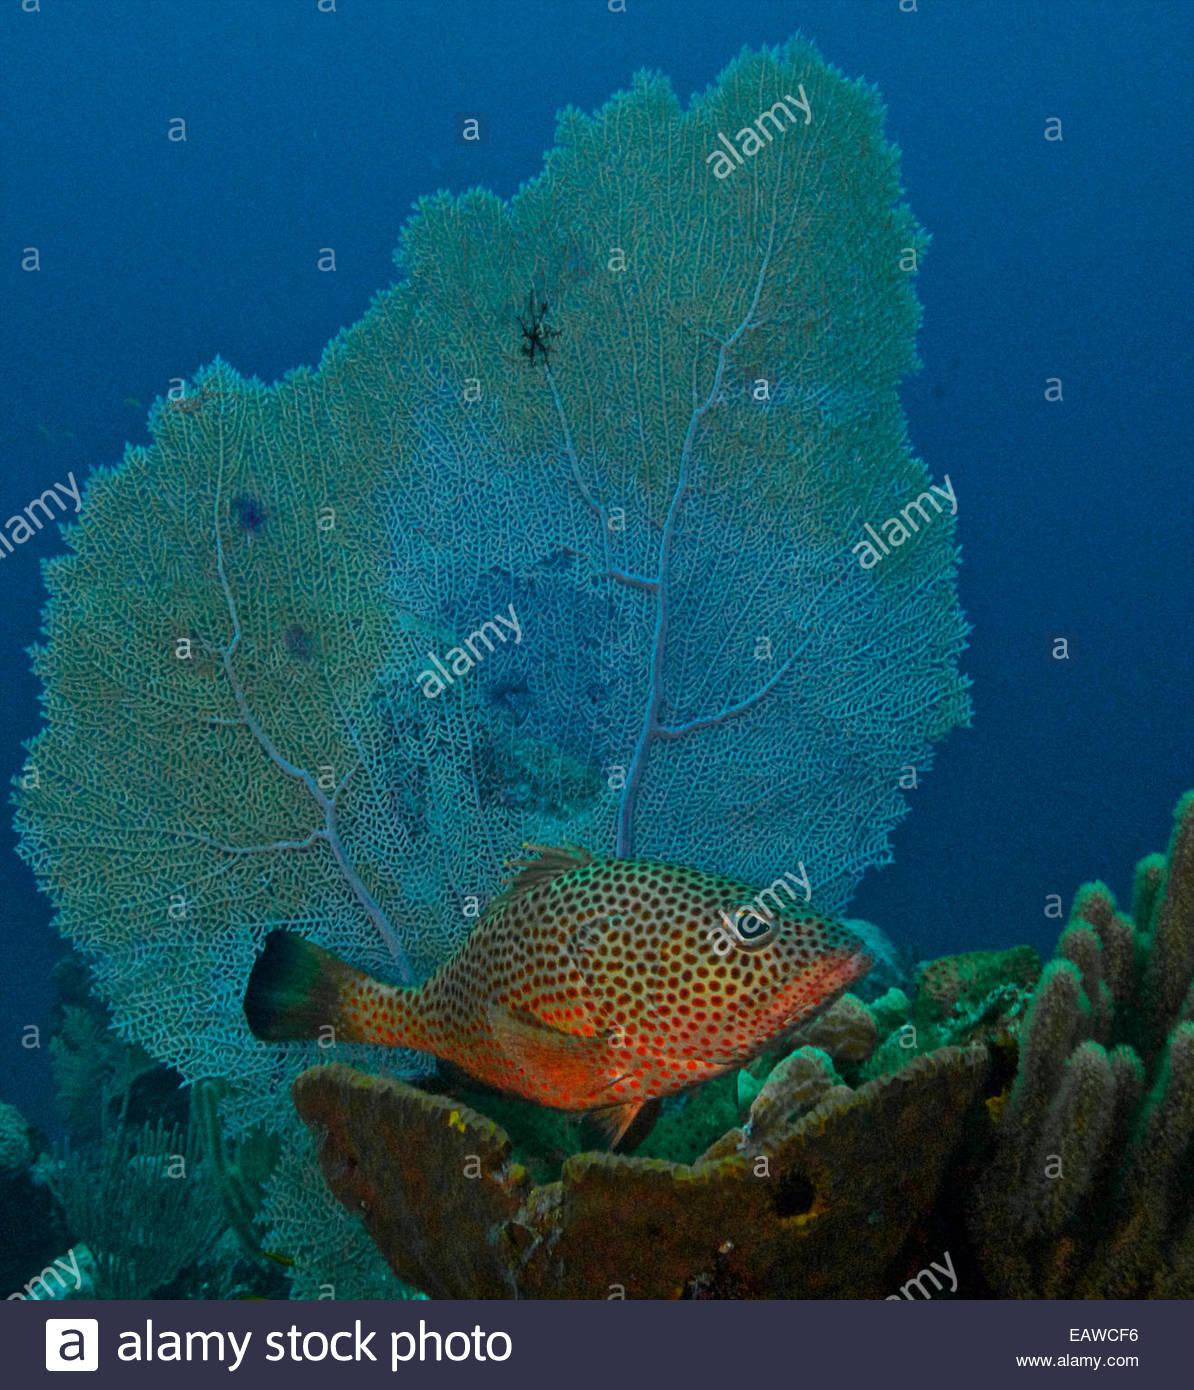 A red hind (Epinephelus guttatus) sheltering under a sea fan. - Stock Image